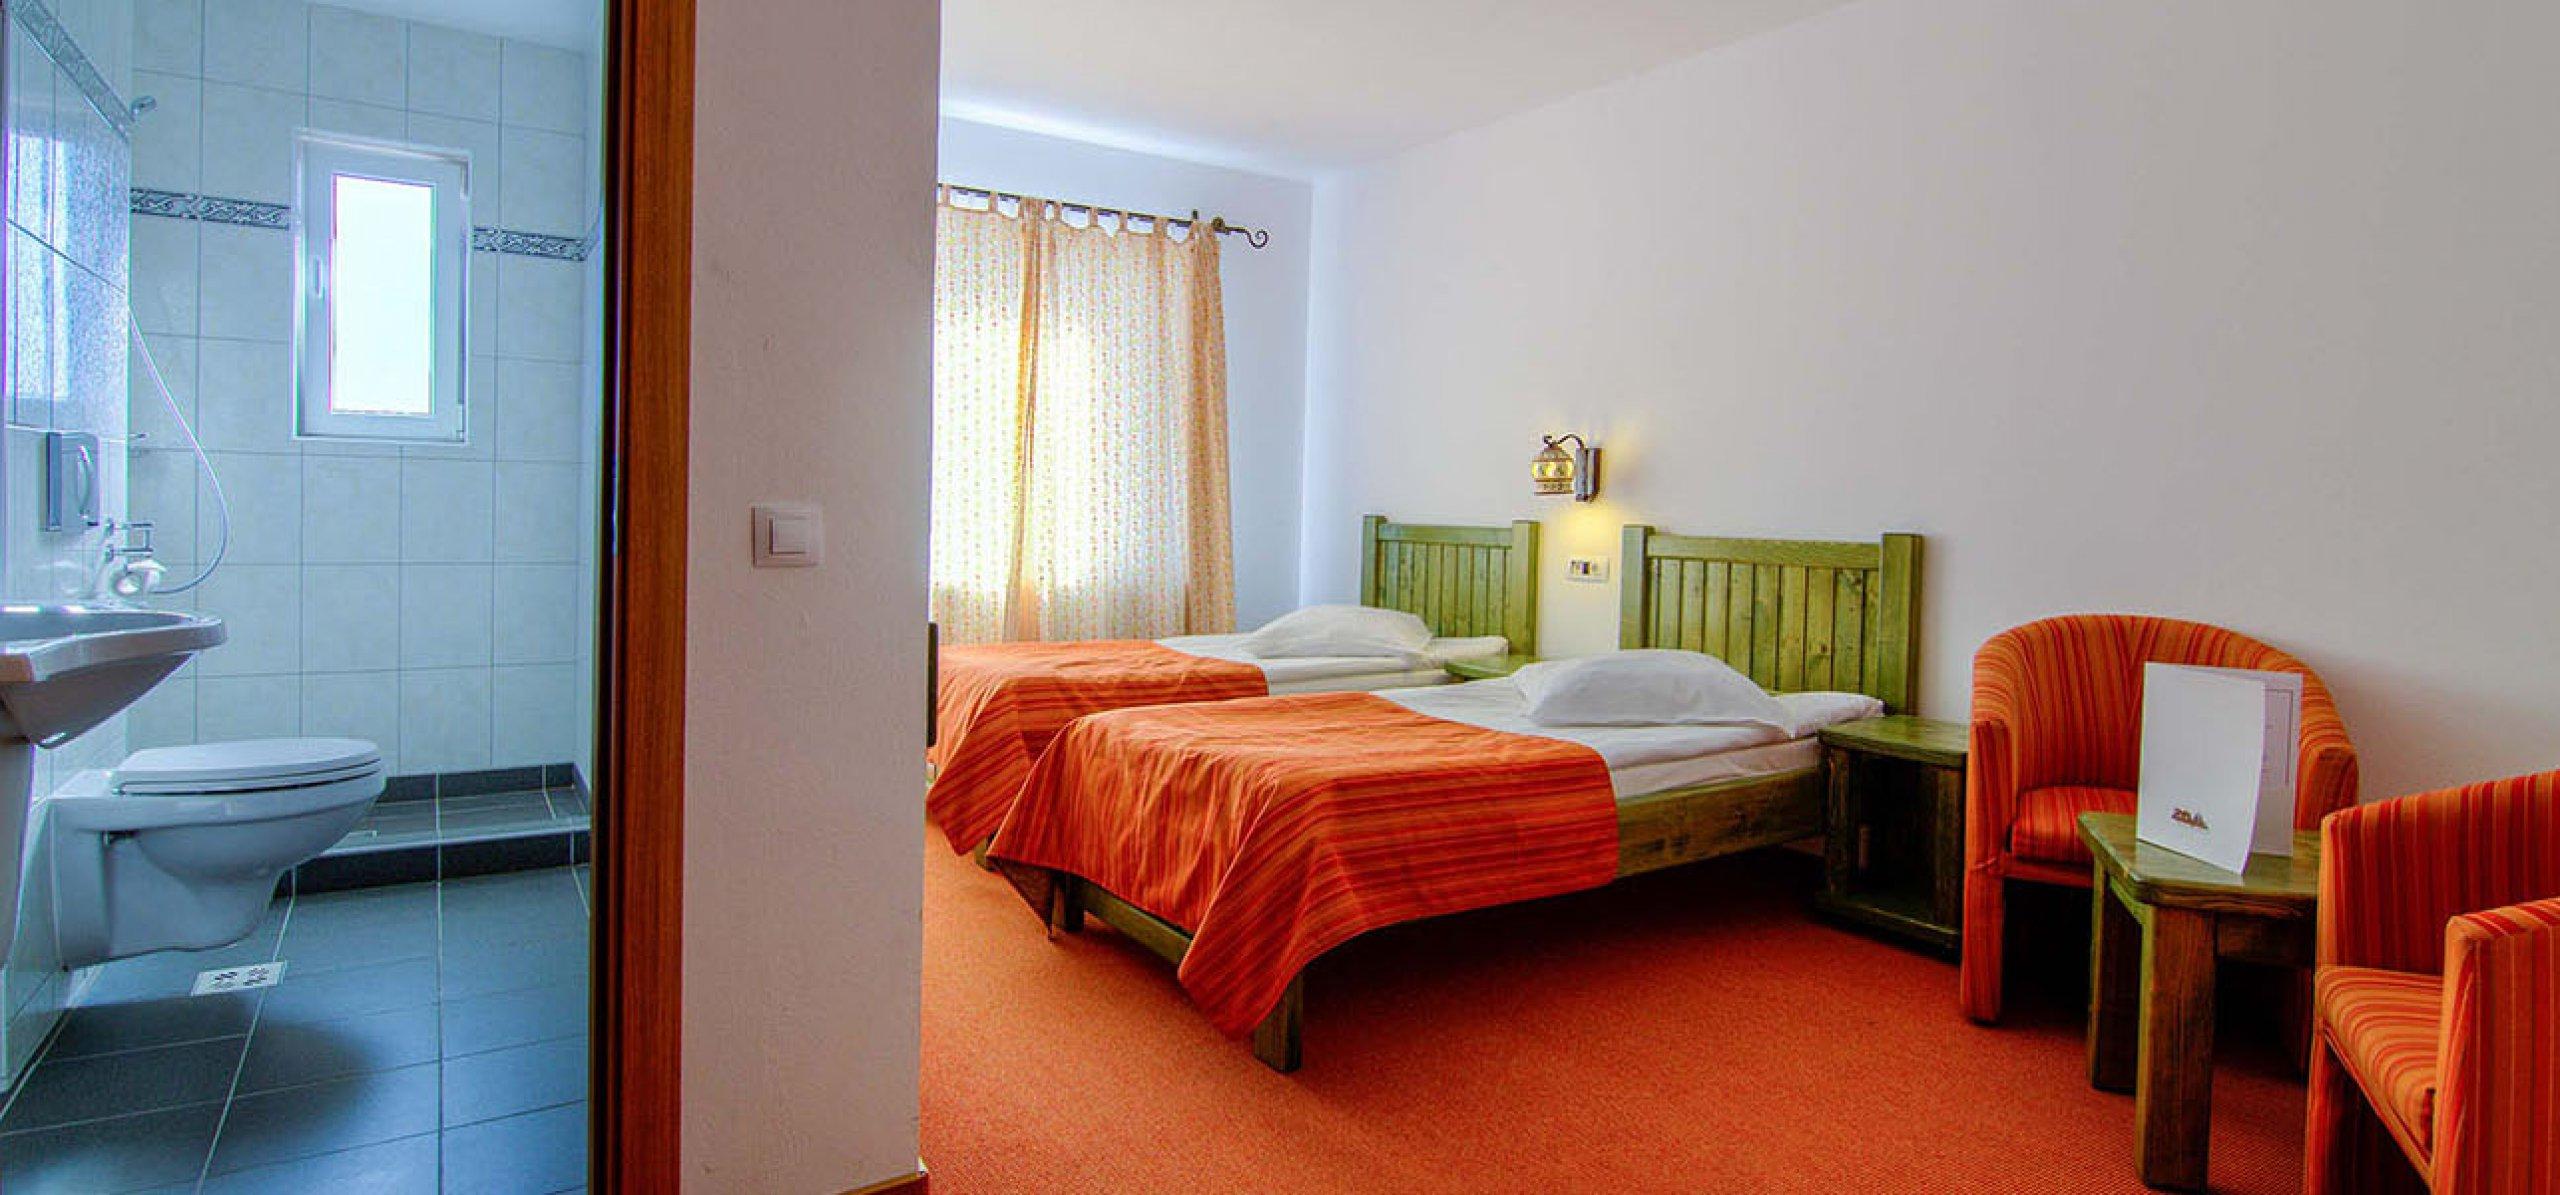 vedere-montana-camera-dubla-hotel-sport-cheile-gradistei-fundata